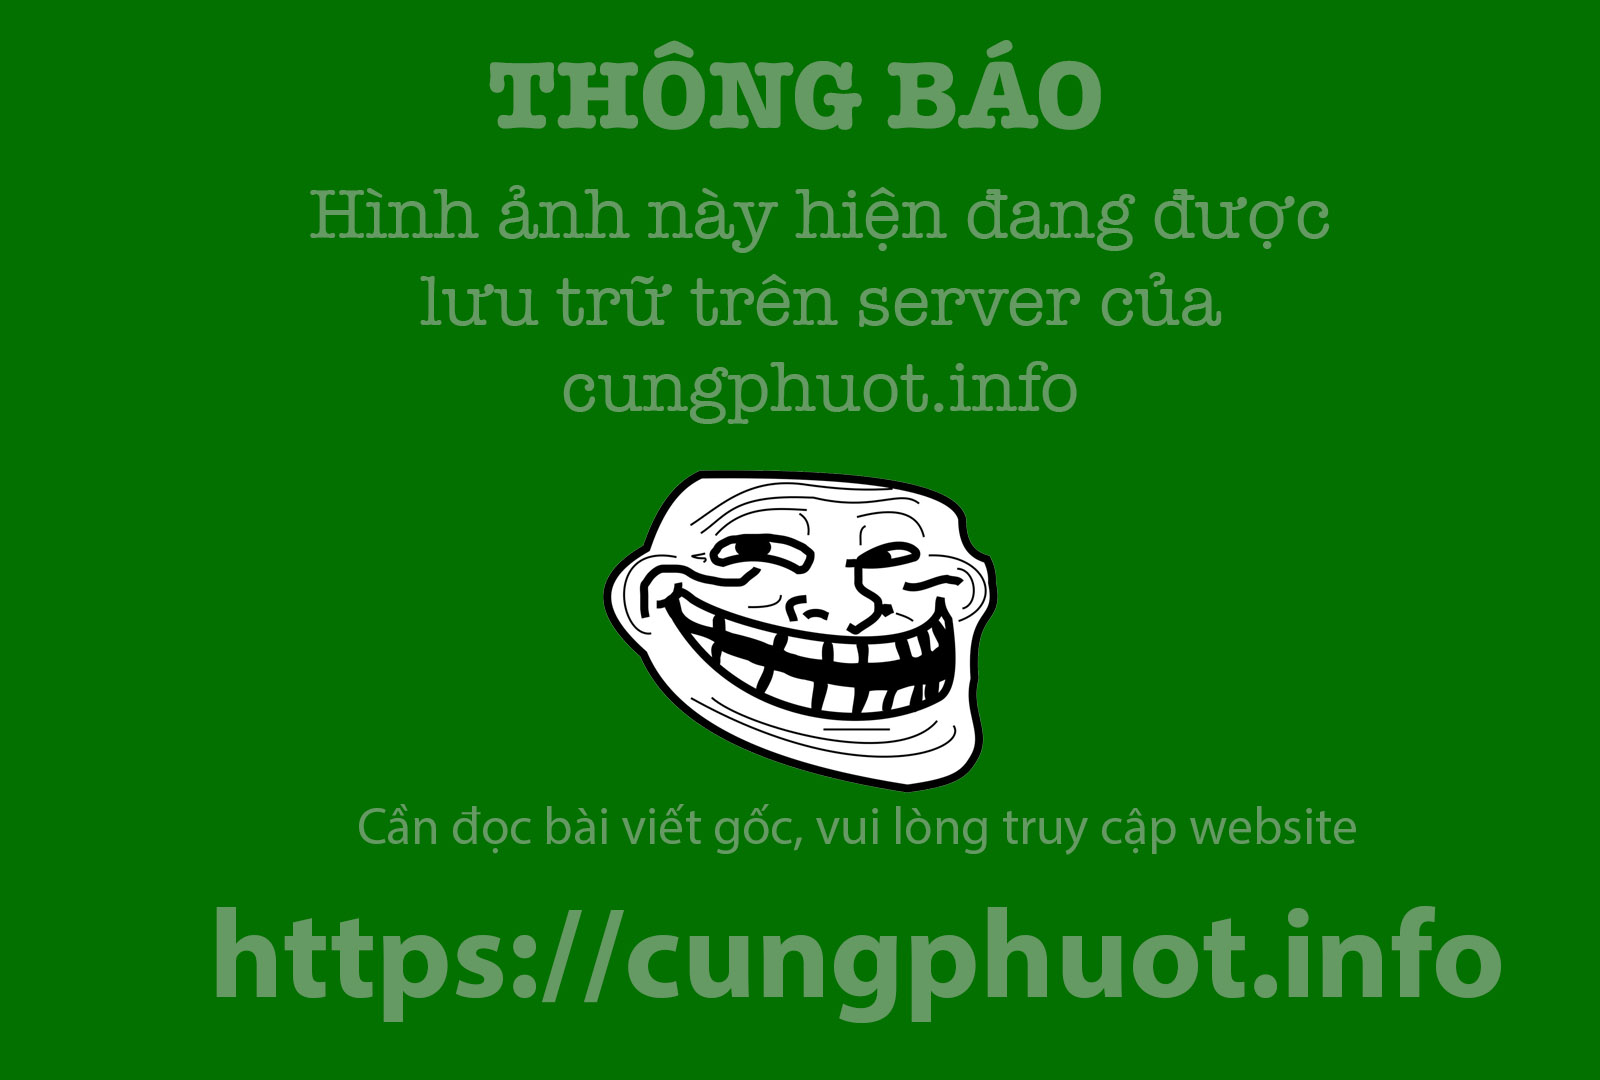 nhung-tiem-ca-phe-dep-phai-di-mot-lan-cho-biet-o-da-nang-ivivu-10